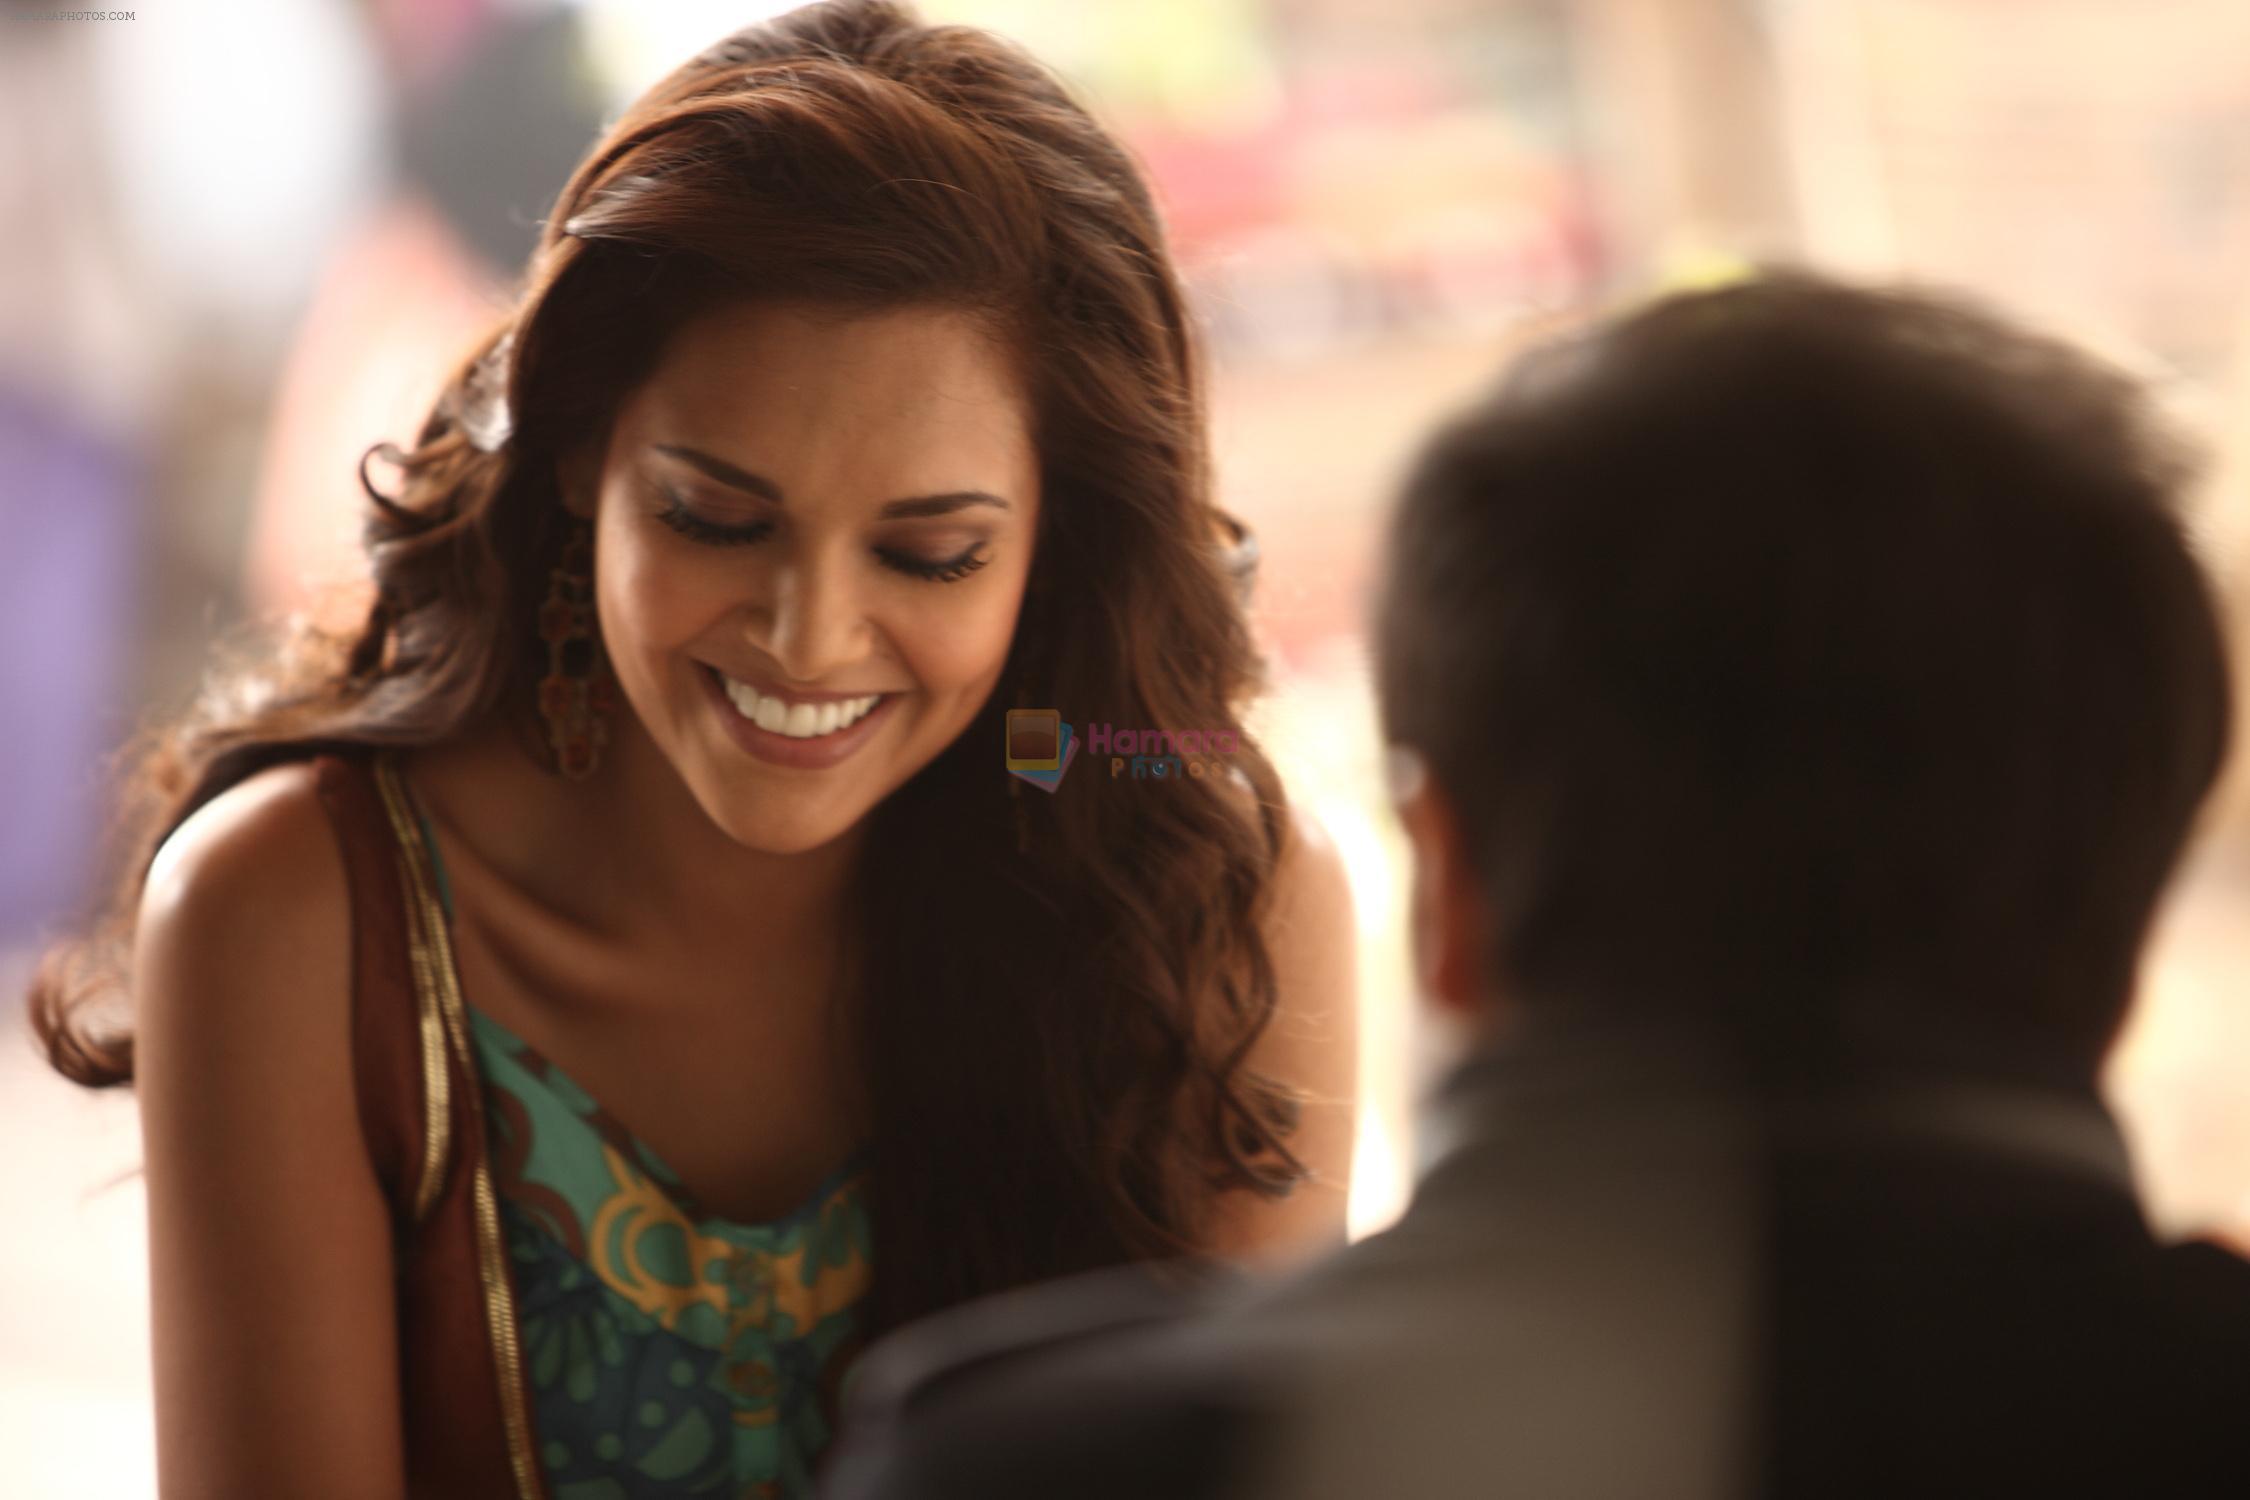 Emraan Hashmi Esha Gupta In The Still From Movie Jannat 2 Jannat2